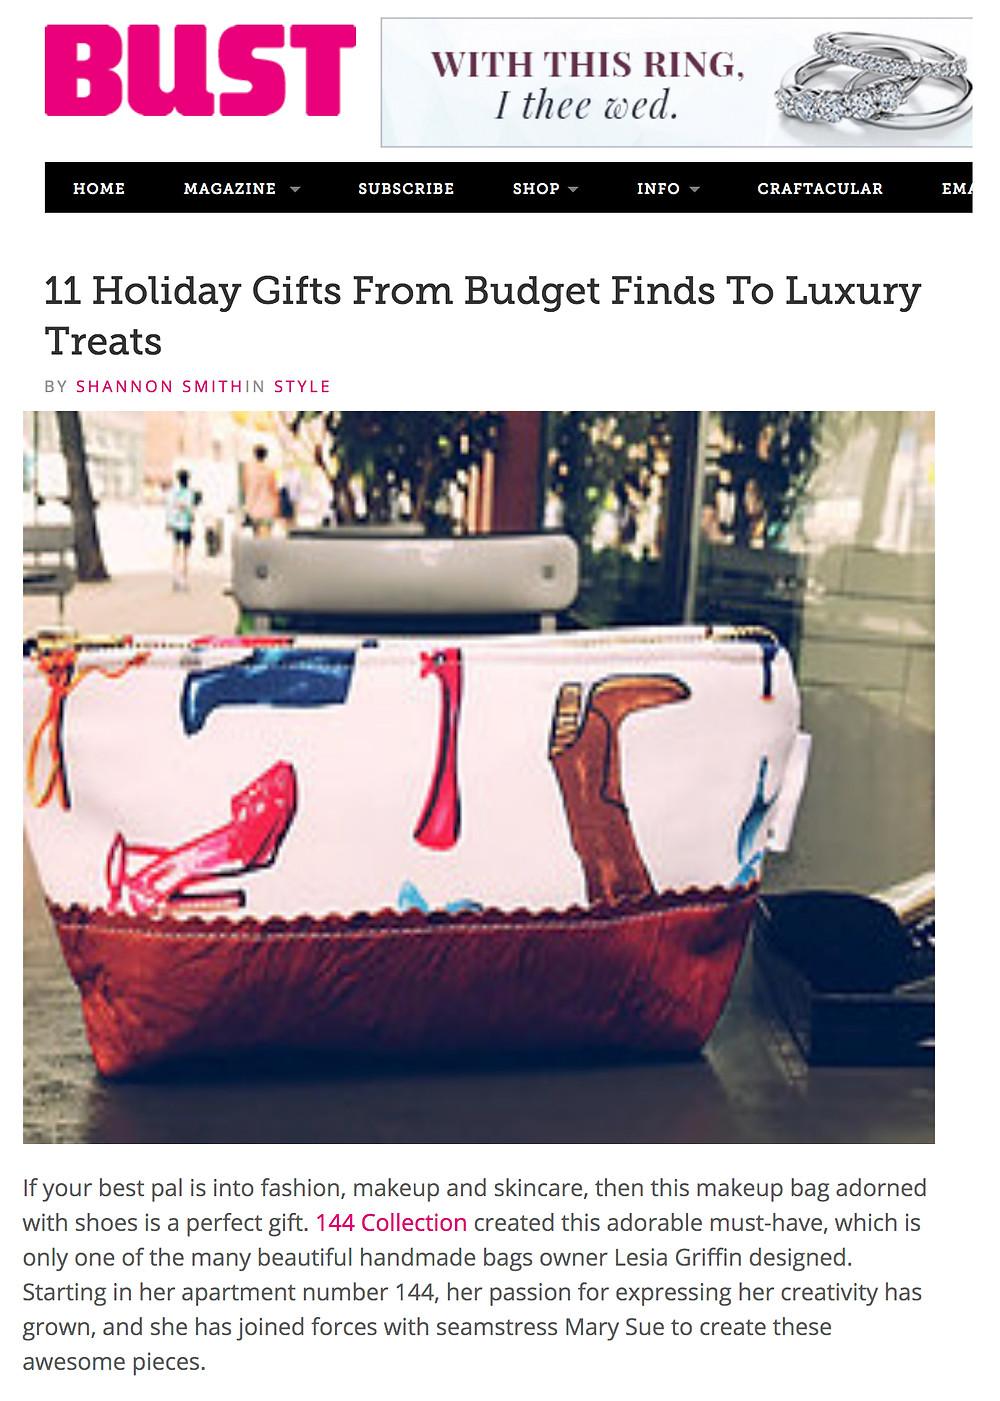 Handmade Makeup Bag - featured in Bust.com